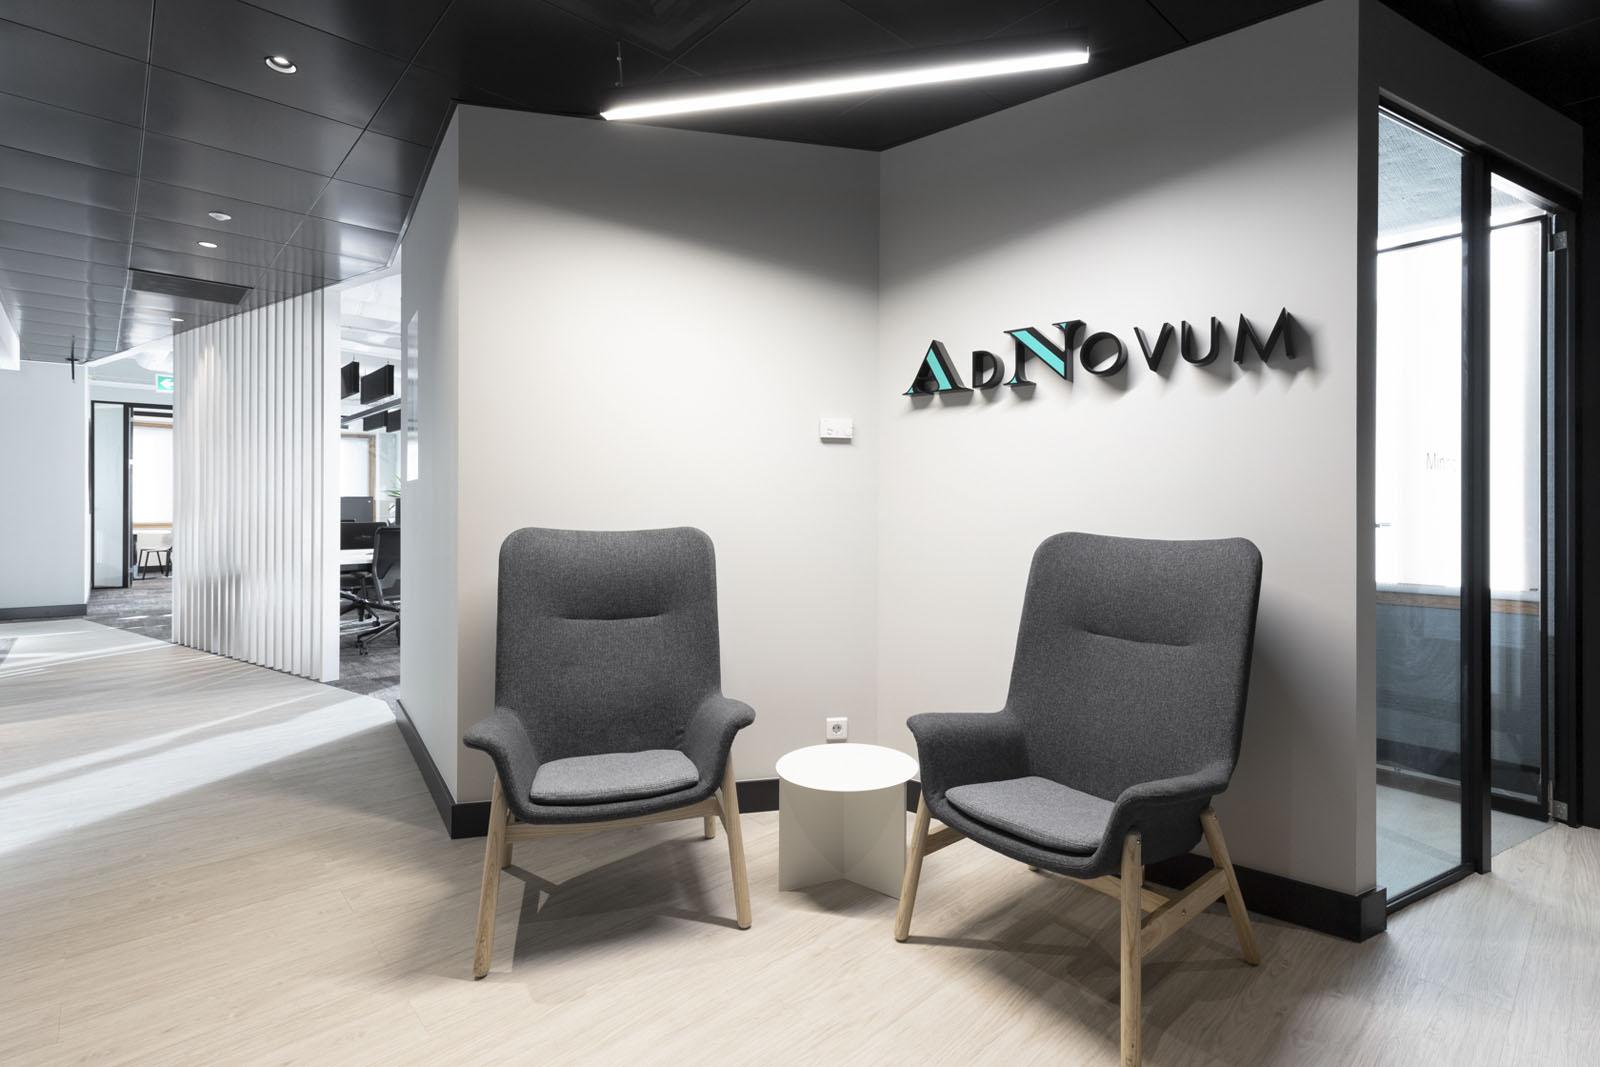 AdNovum_20190527_0154-2_copy_LR.jpg